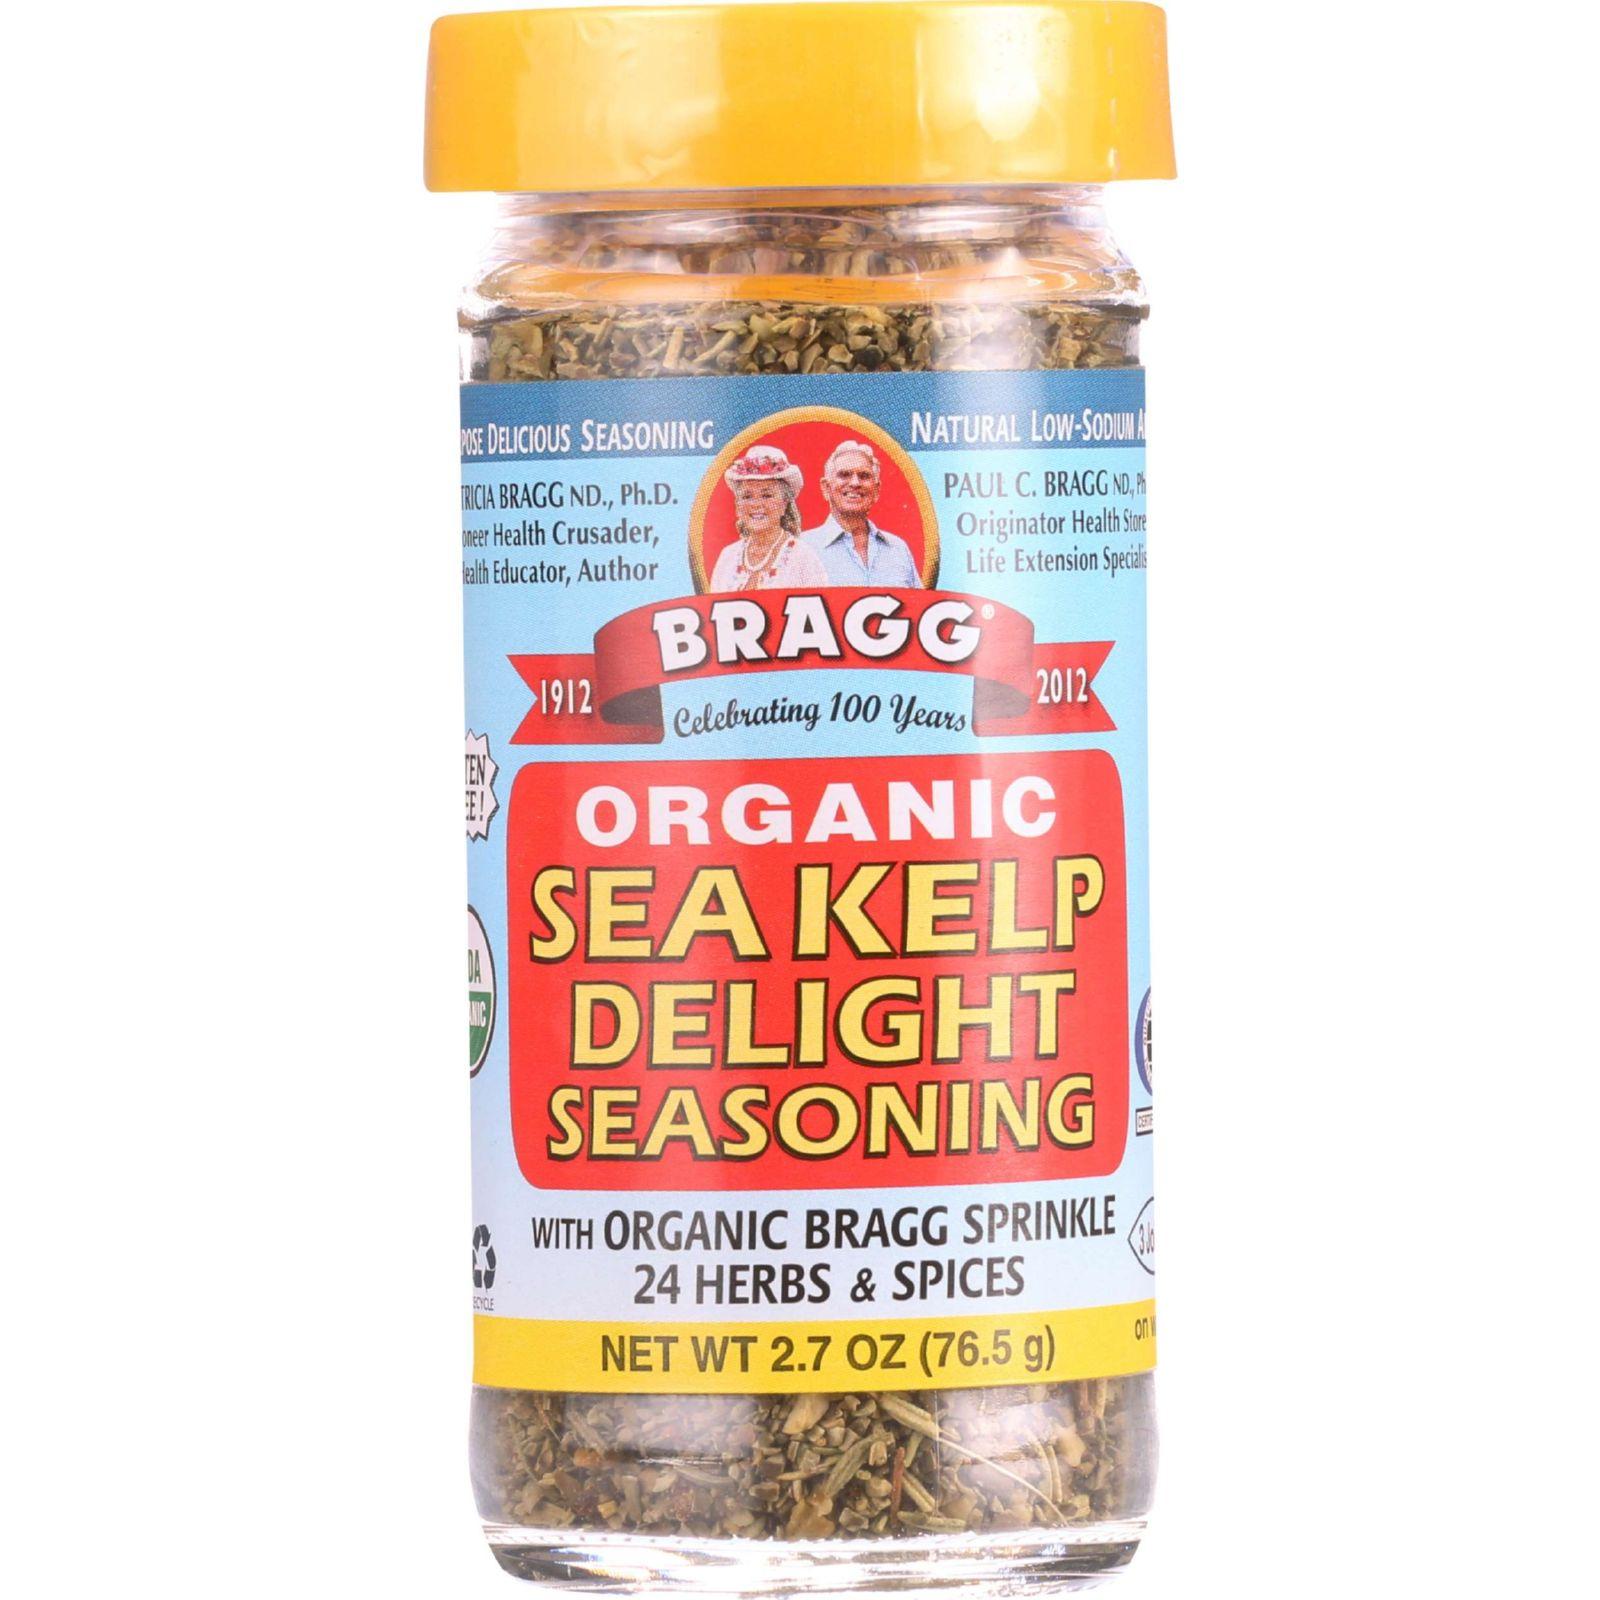 Bragg Seasoning Organic Sea Kelp Delight 2.7 oz case of 12 by